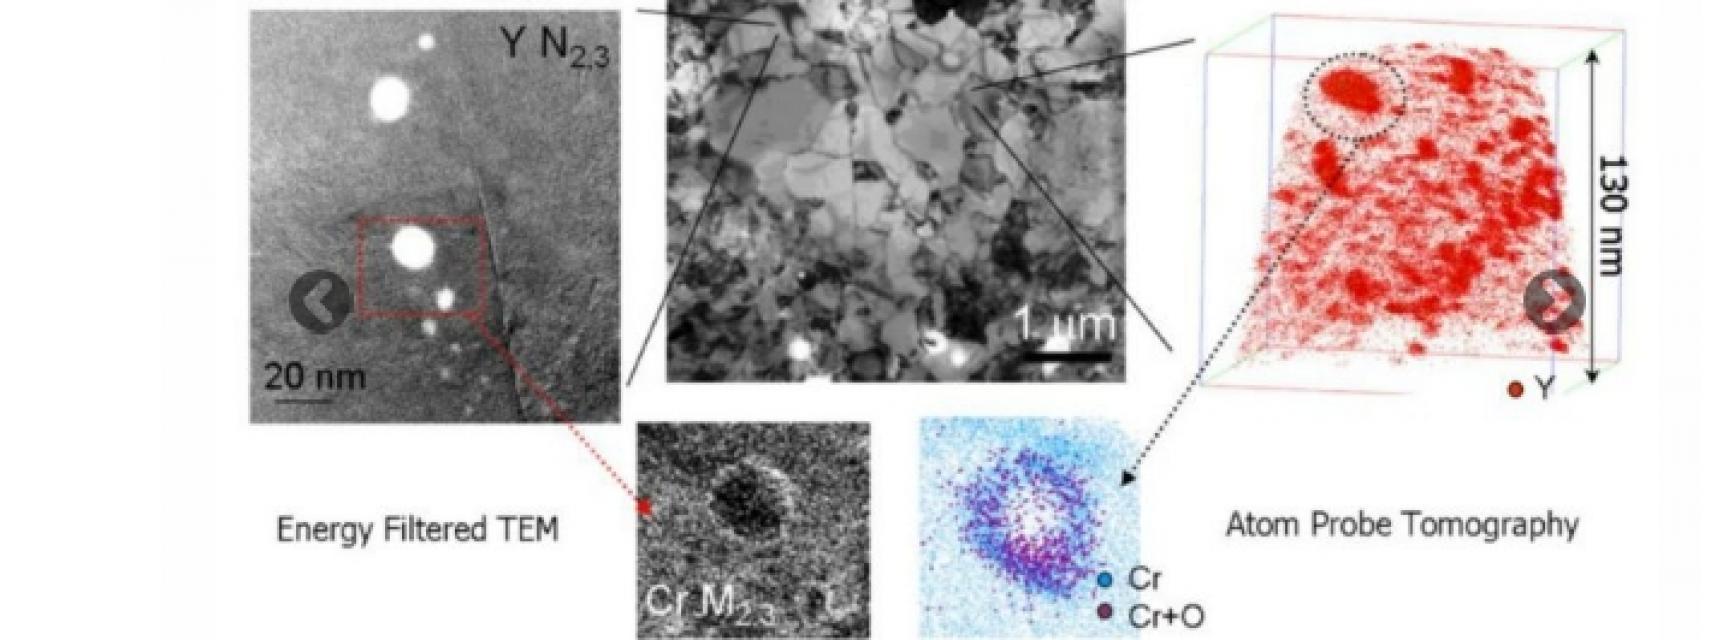 Characterization of nanoscale precipitates